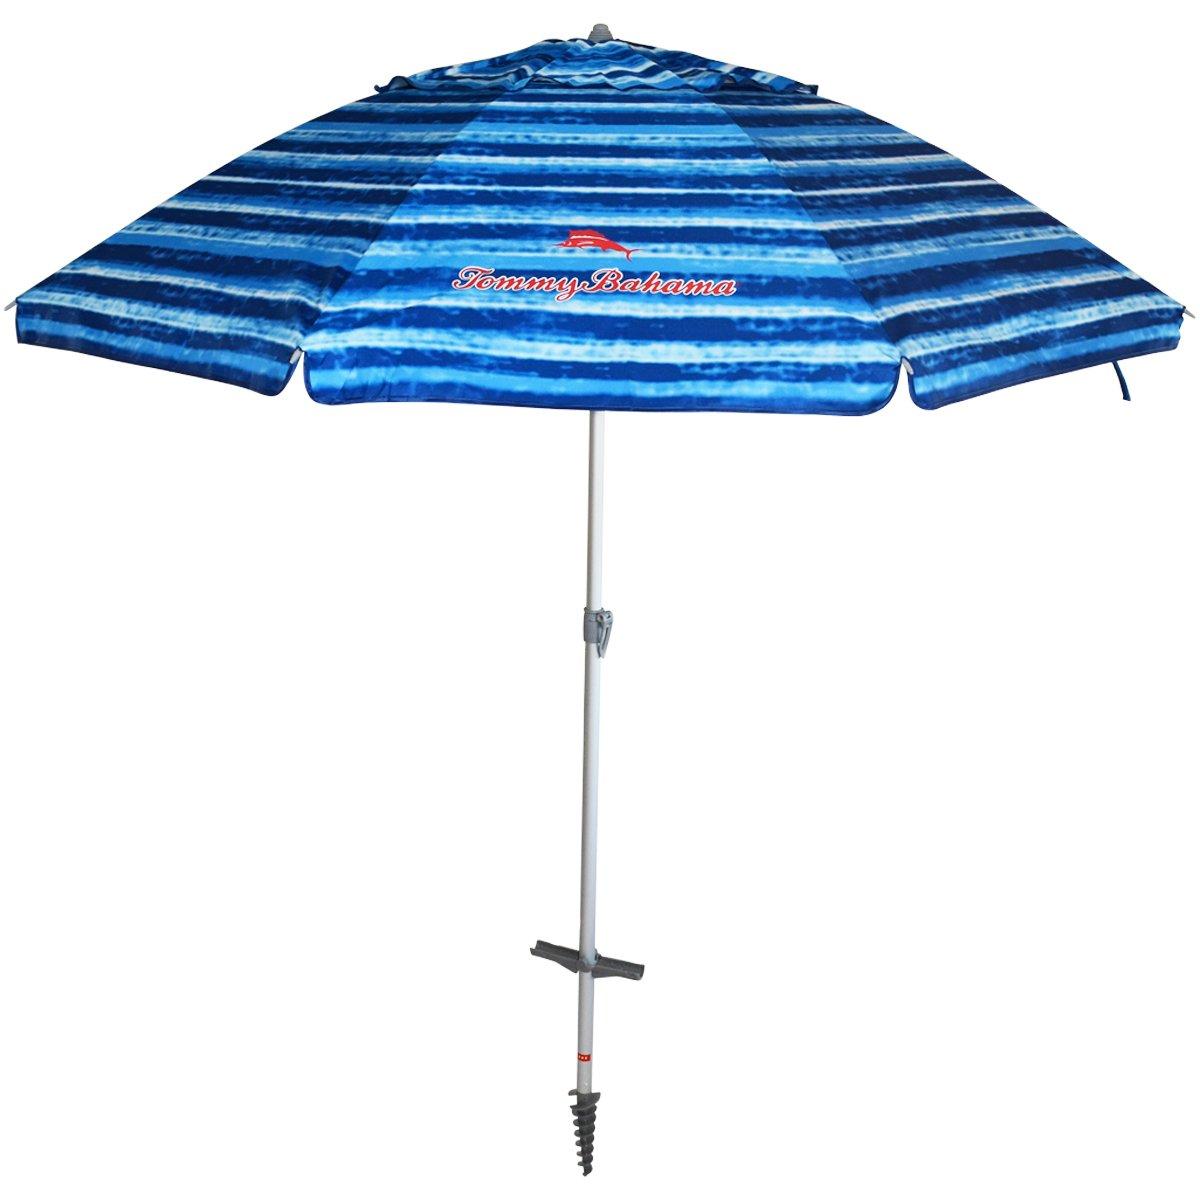 Tommy Bahama Sand Anchor 7 feet Beach Umbrella with Tilt and Telescoping Pole Blue White